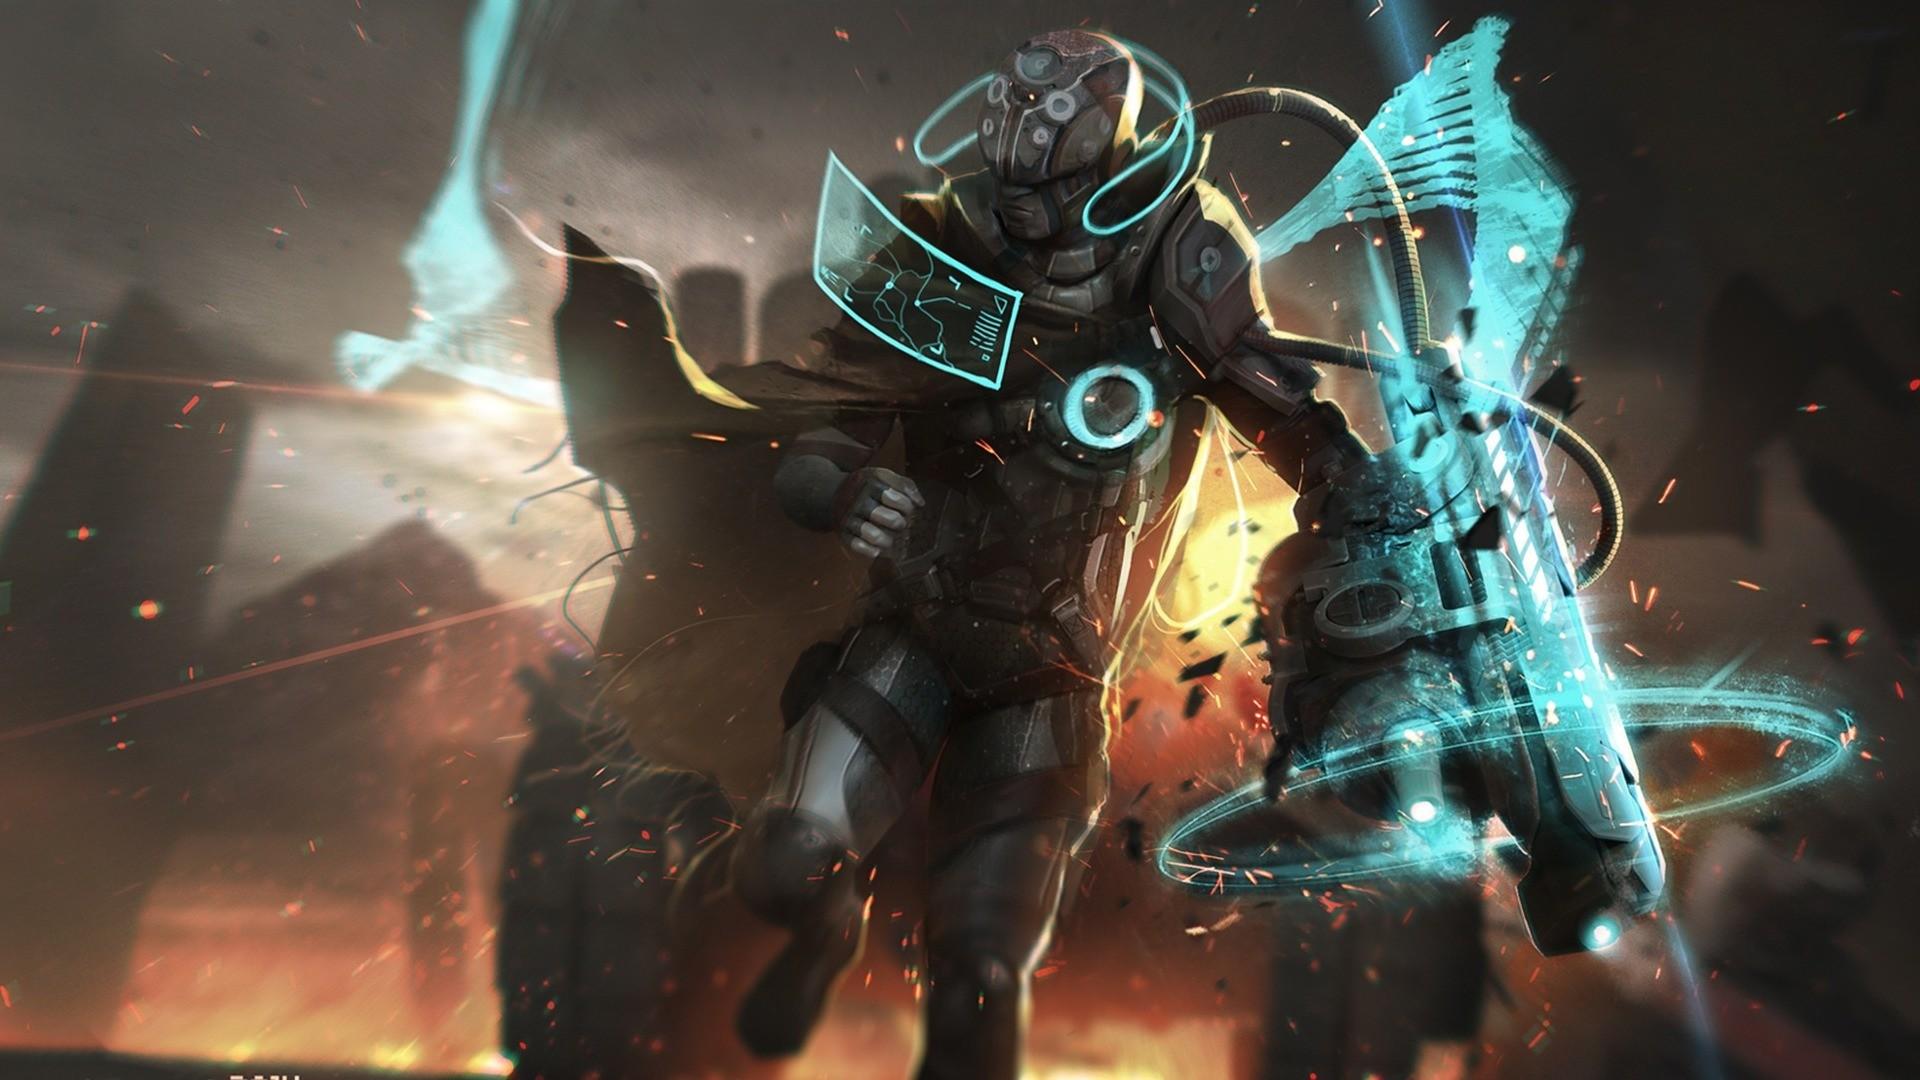 General 1920x1080 artwork futuristic armor science fiction digital art cyan